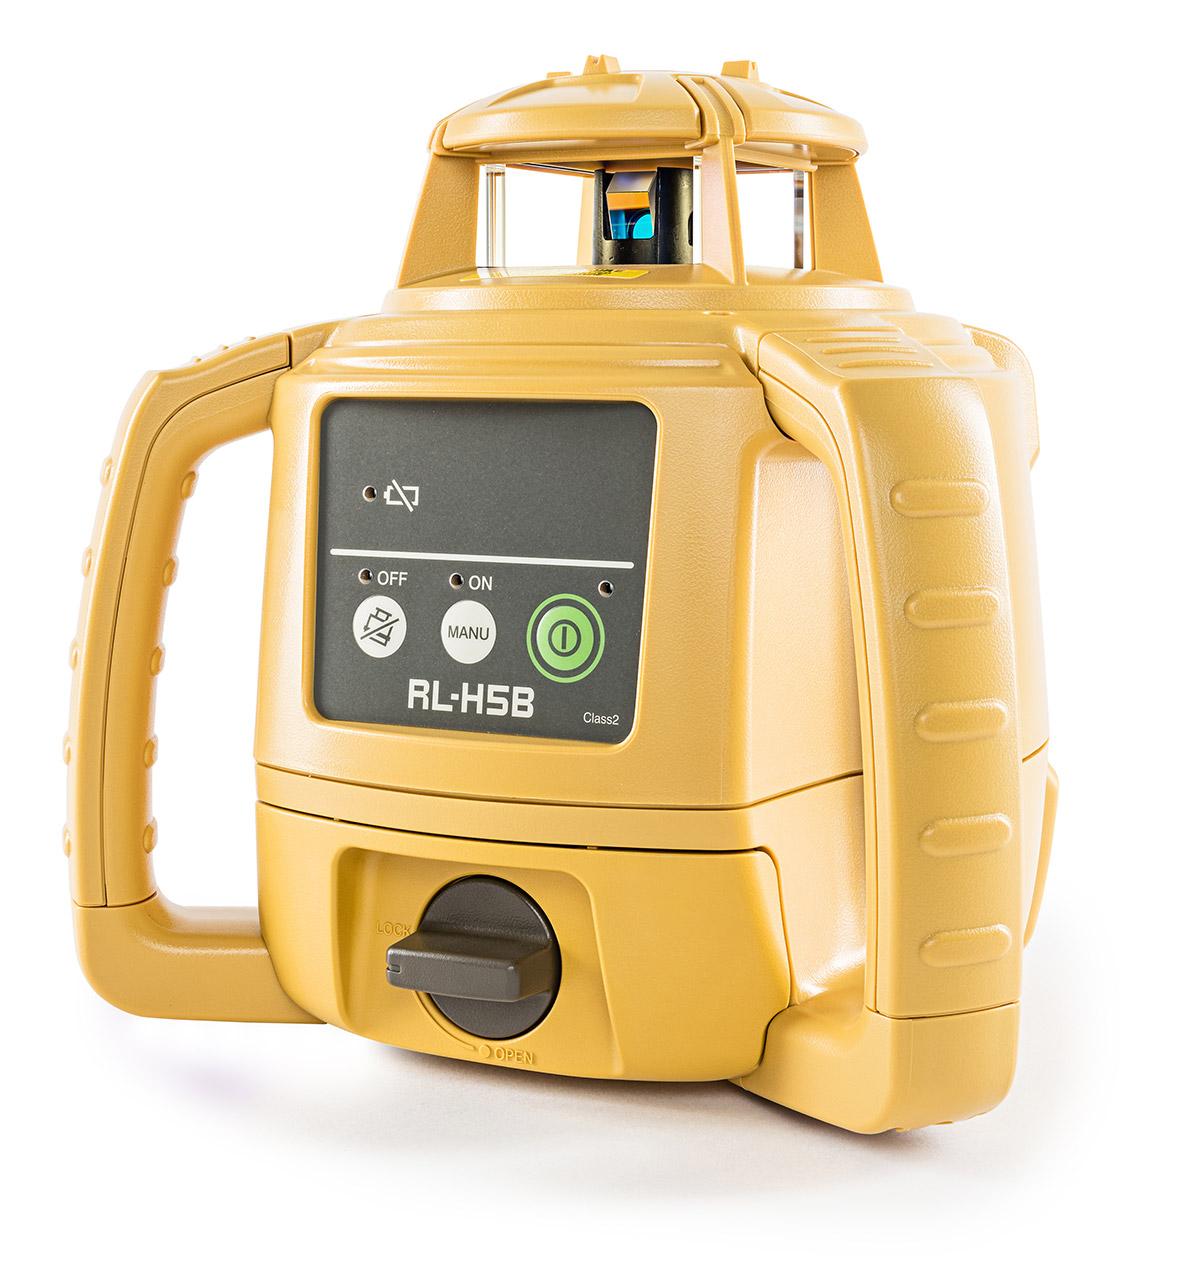 Topcon-Construction-Lasers-RL-H5B-7